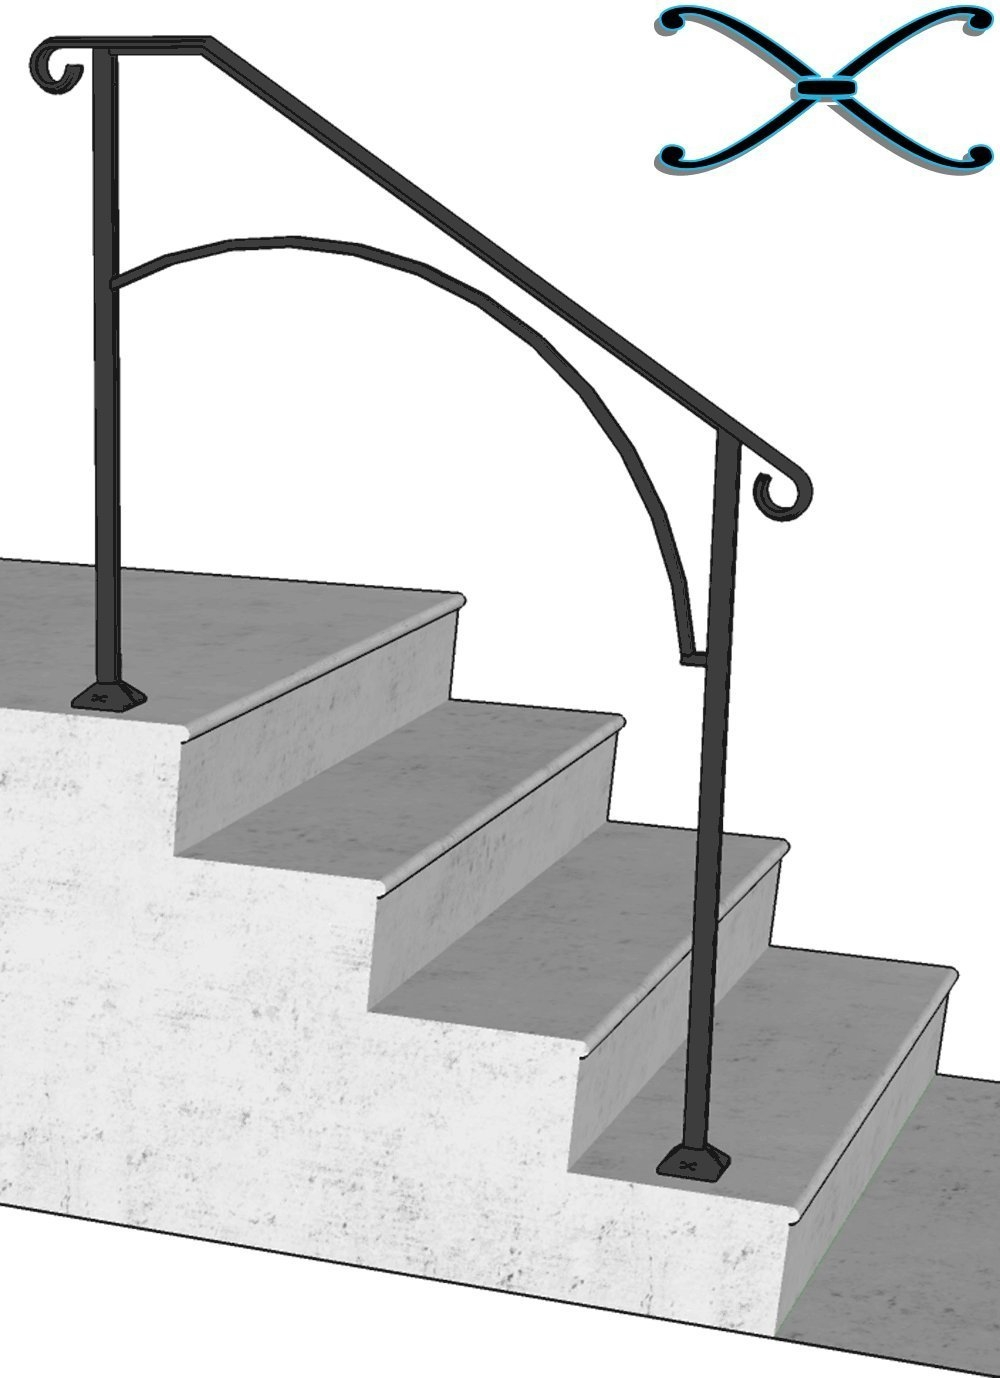 Iron X Handrail Arch 3 Concrete Steps Walmart Com Walmart Com   Handrails For Concrete Steps   Concrete Surface Mount Stair Railing   Back Patio   Premade   Landing   Deck Stair